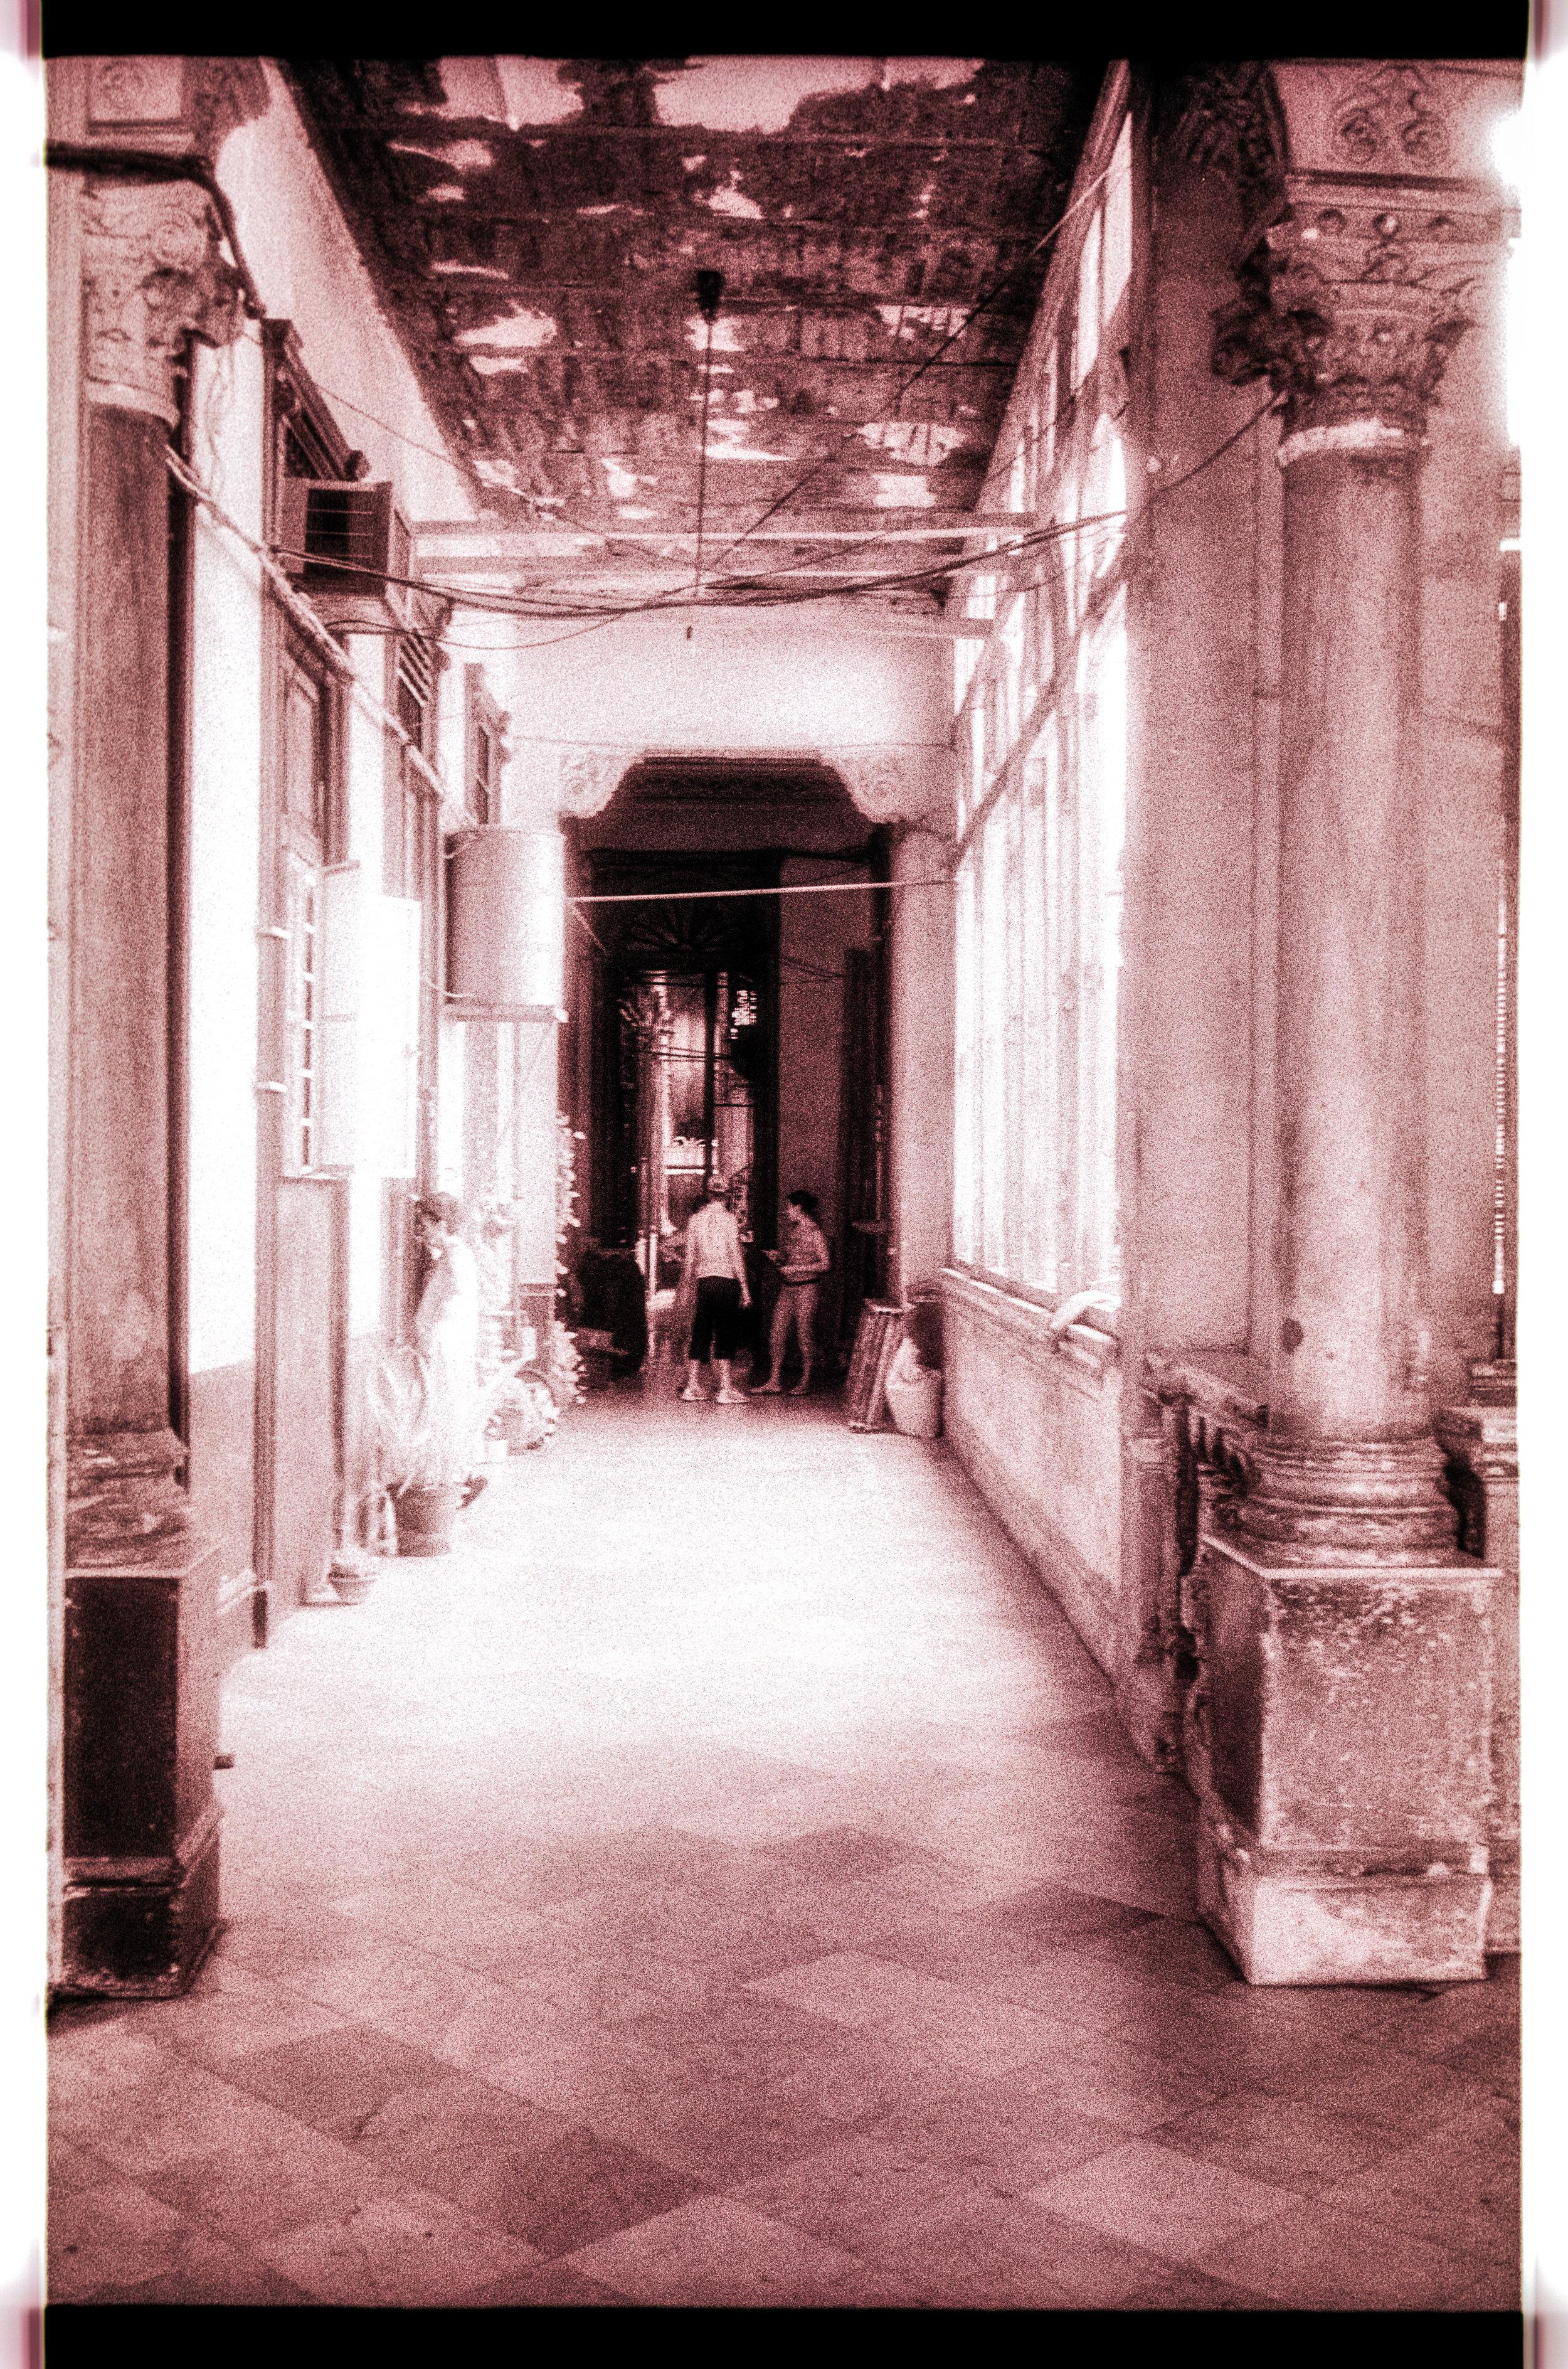 Siesta_Cuba-07.jpg